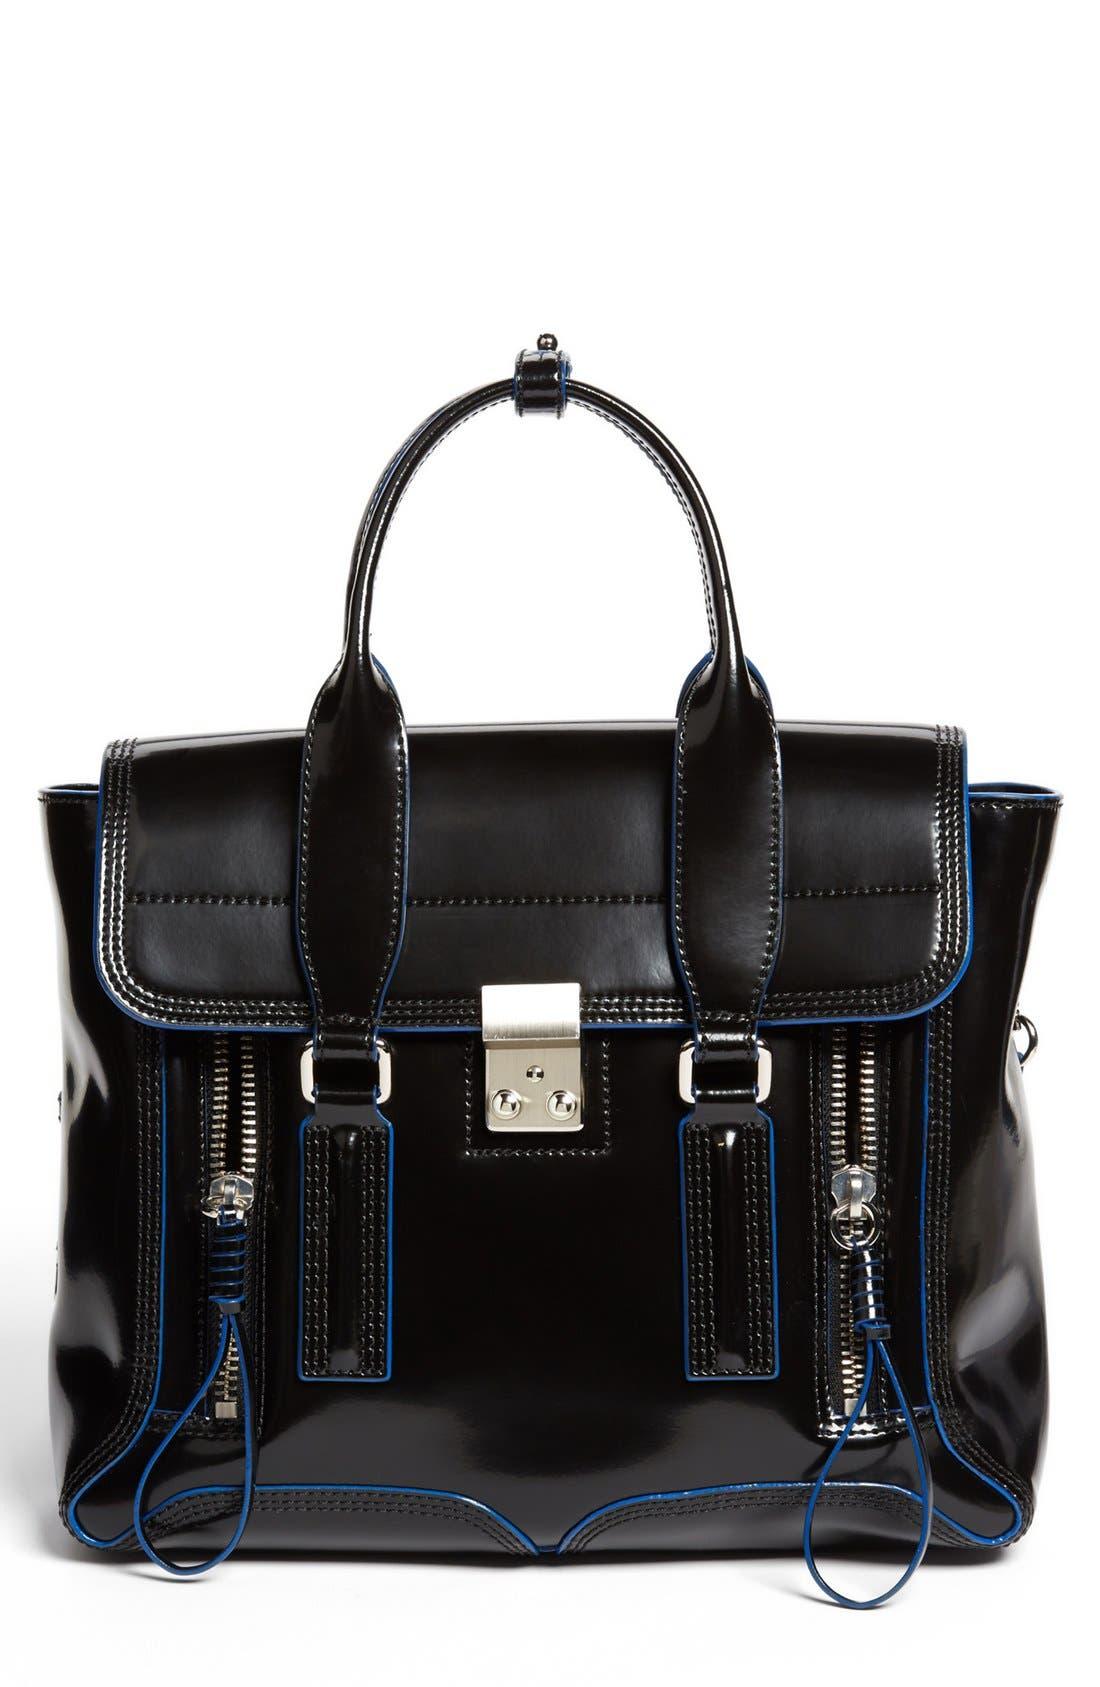 Main Image - 3.1 Phillip Lim 'Medium Pashli' Spazzolato Leather Satchel